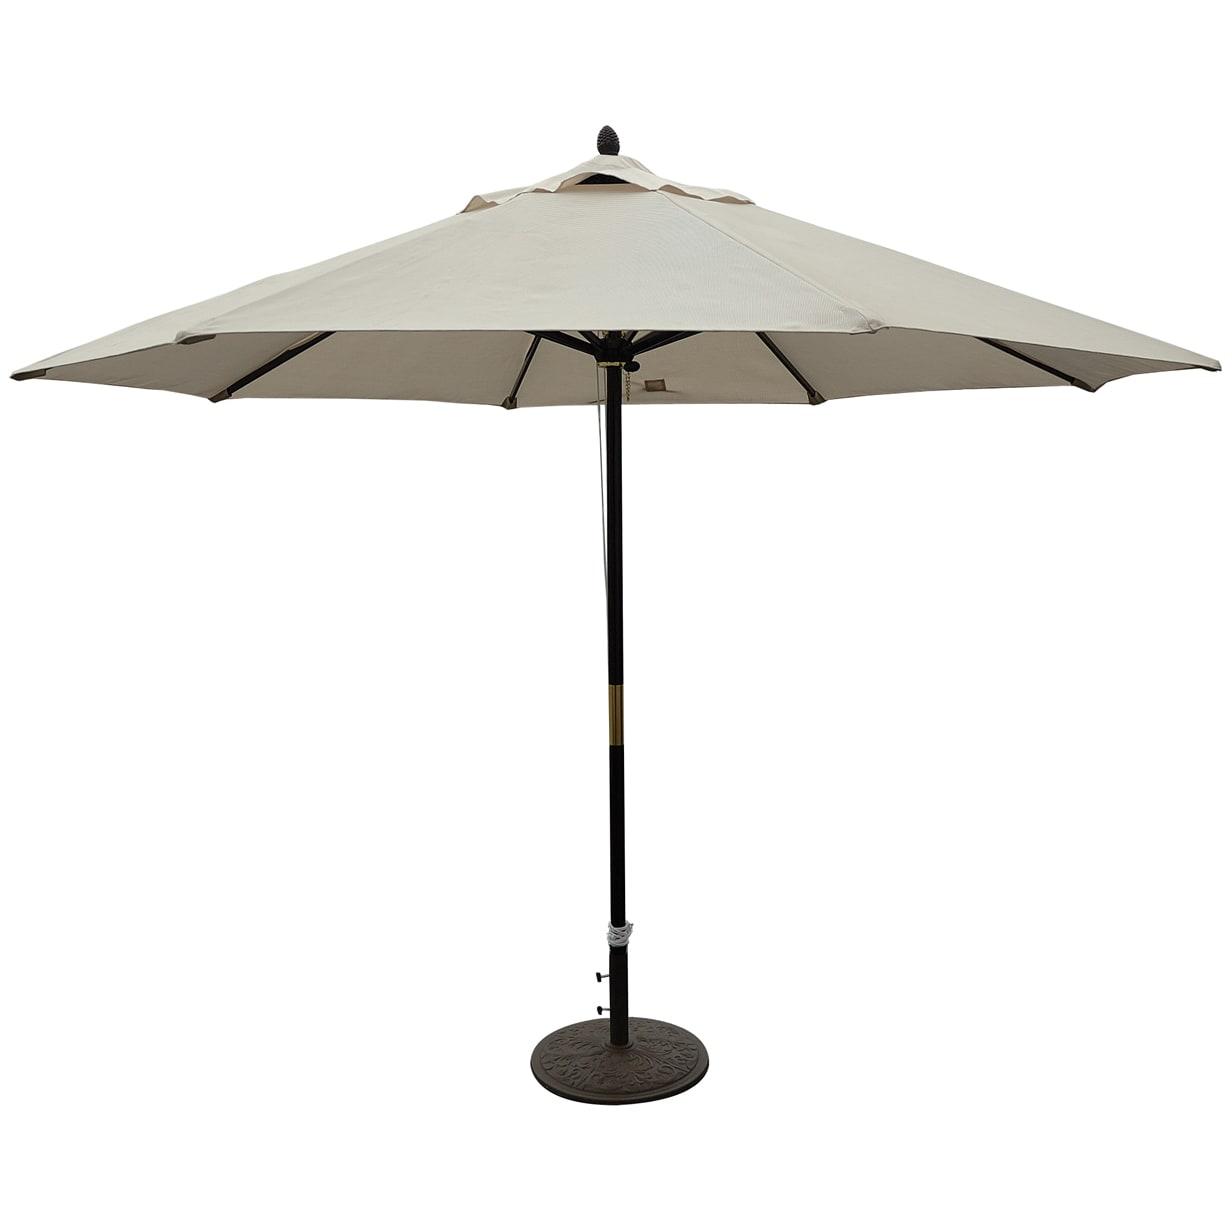 Outdoor Patio Market Umbrella Non Tilt Pulley Lift System Weather Resistant 11